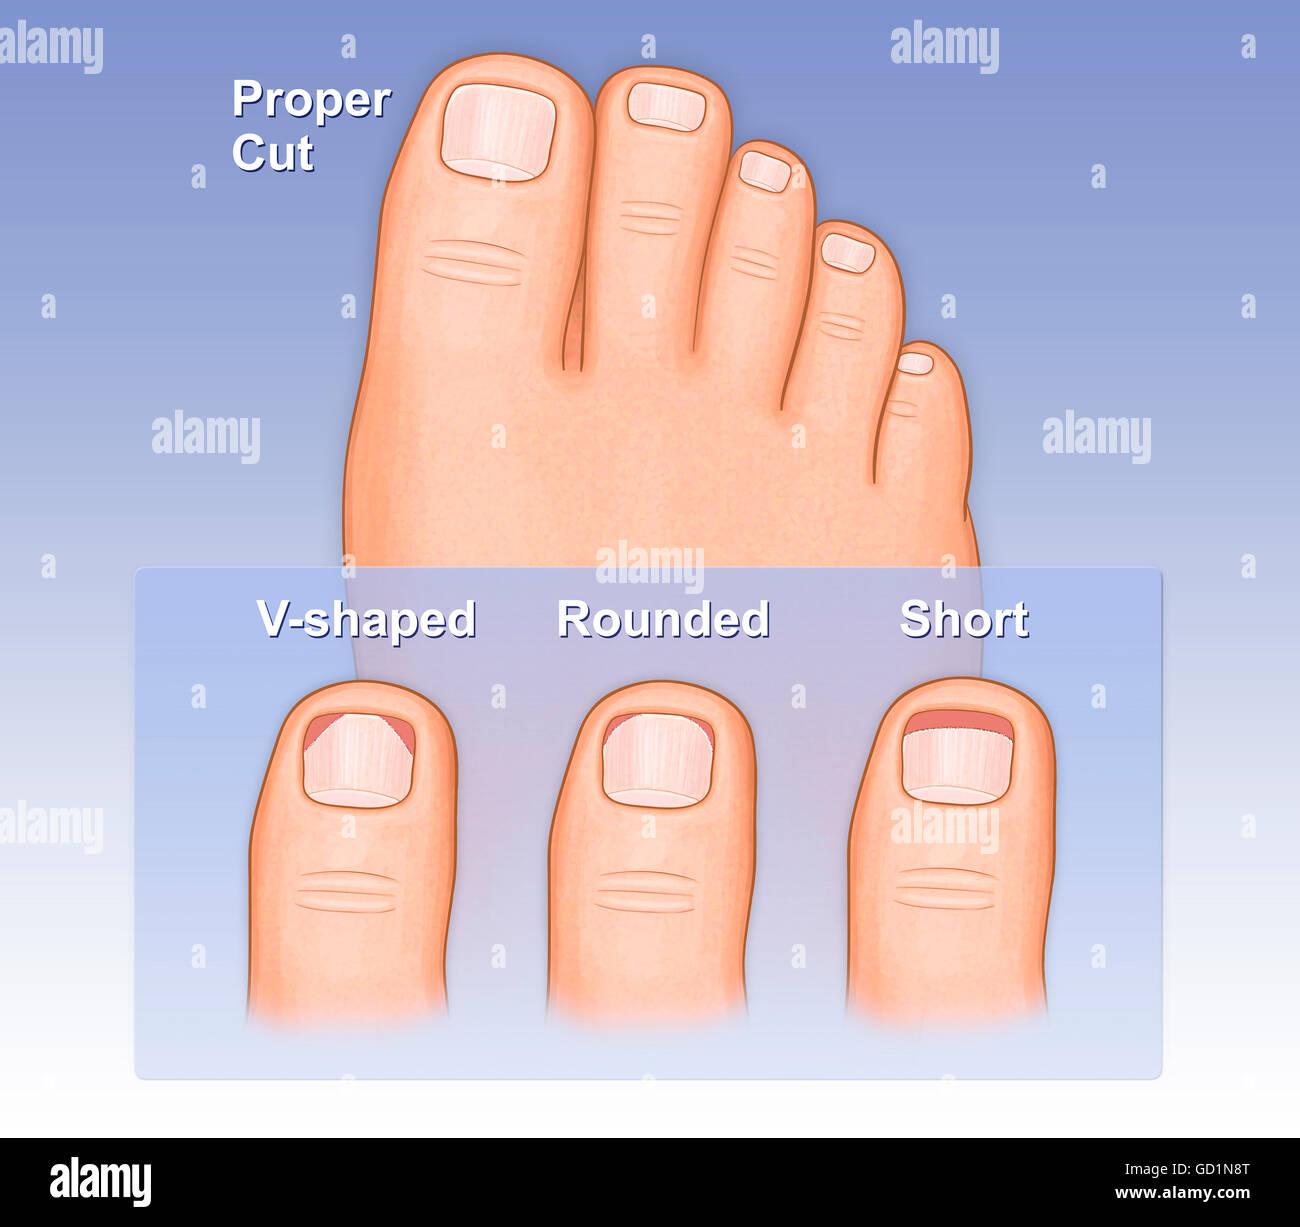 Showing a proper way to cut toe nails versus and improper way